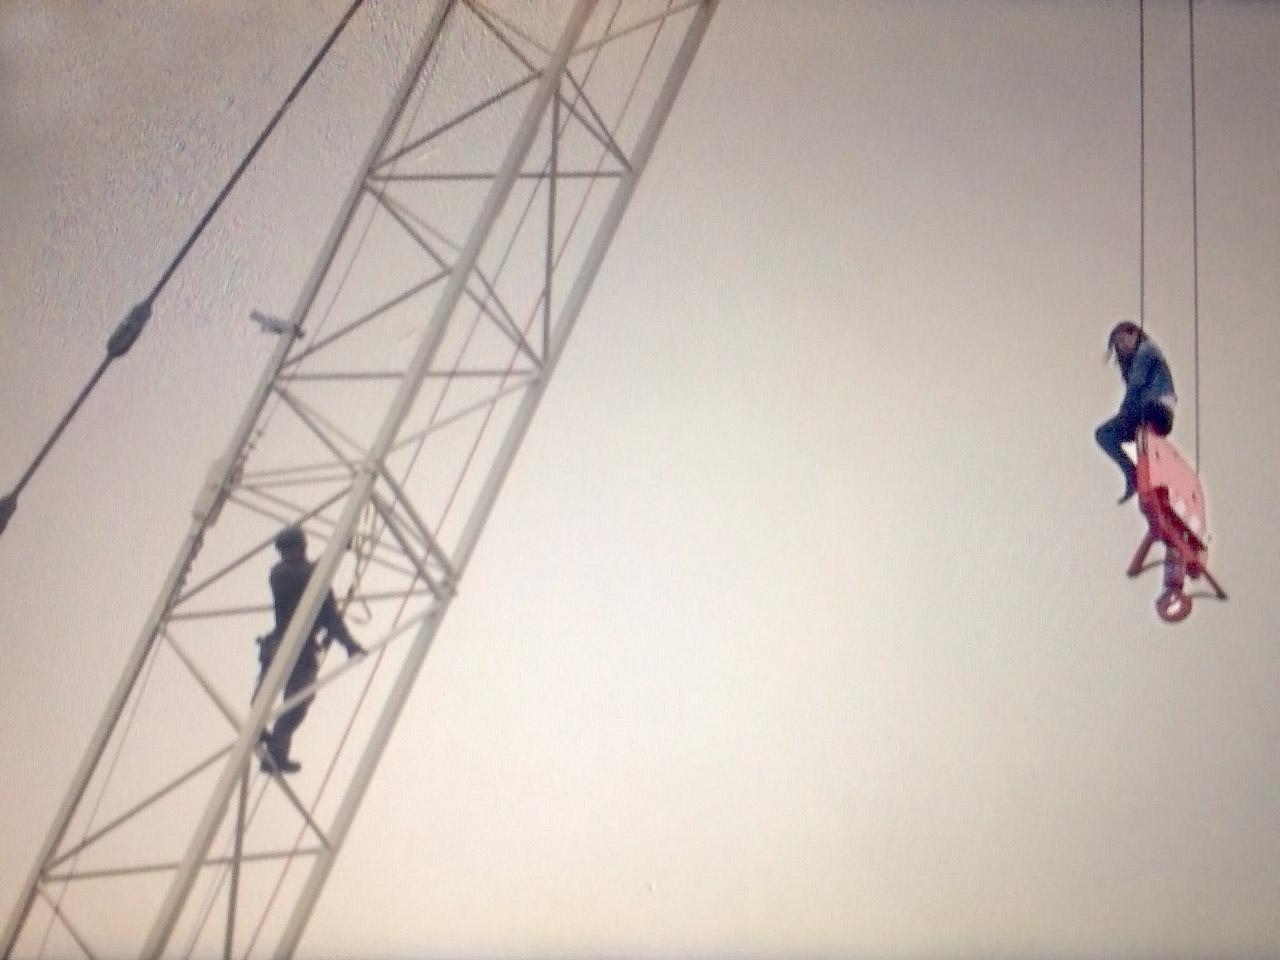 don u0027t climb on construction cranes police warn 680 news